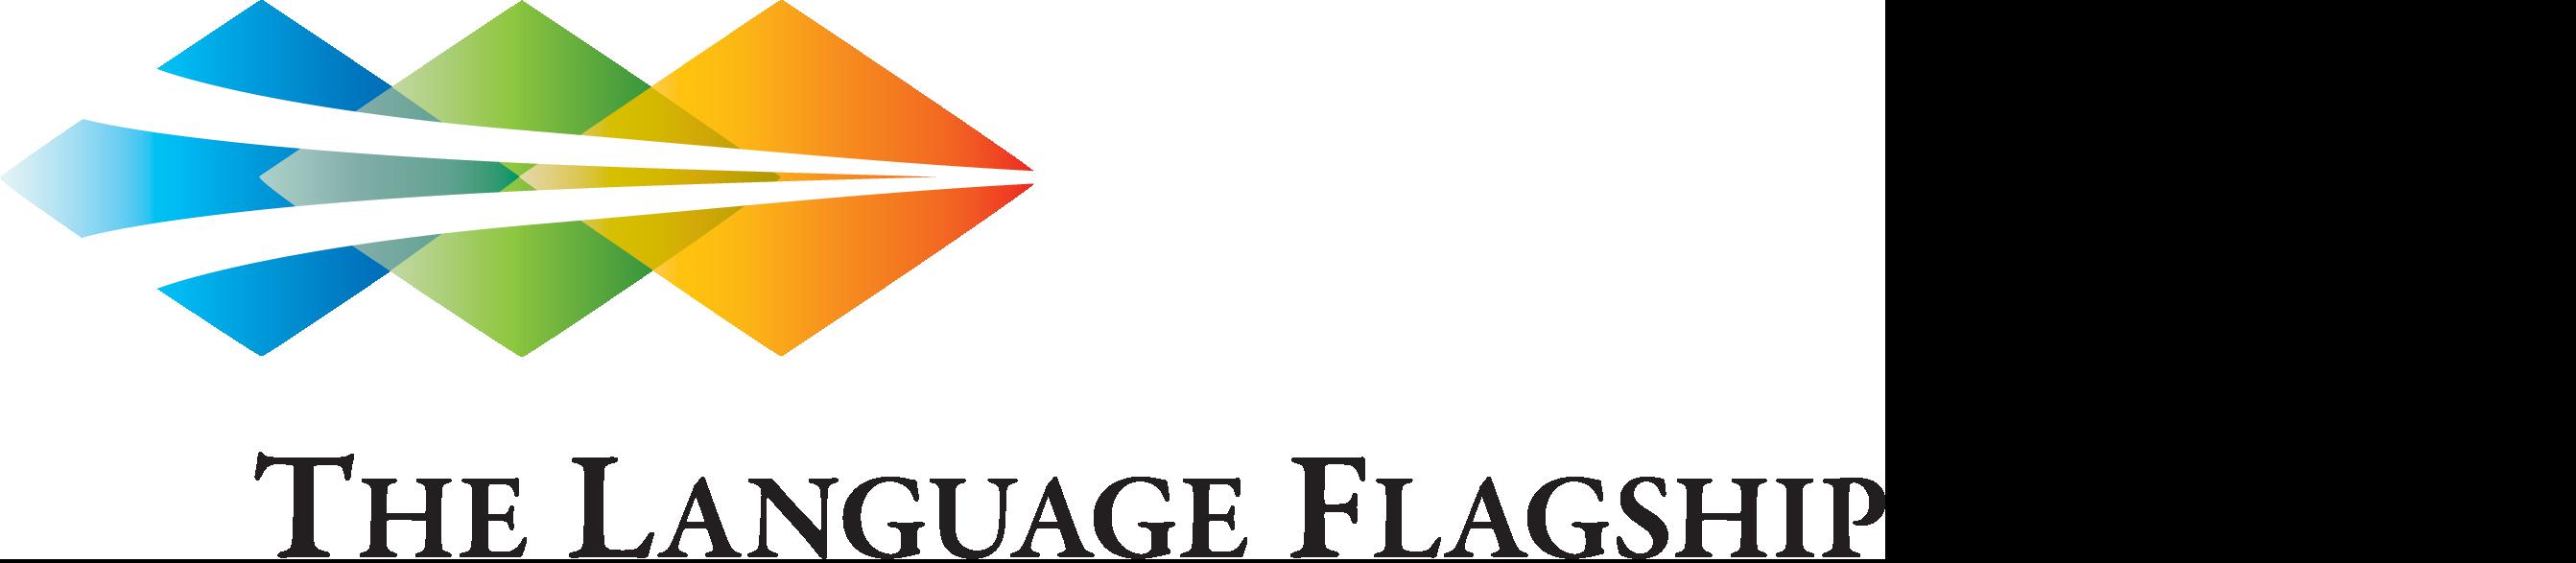 The Language Flagship